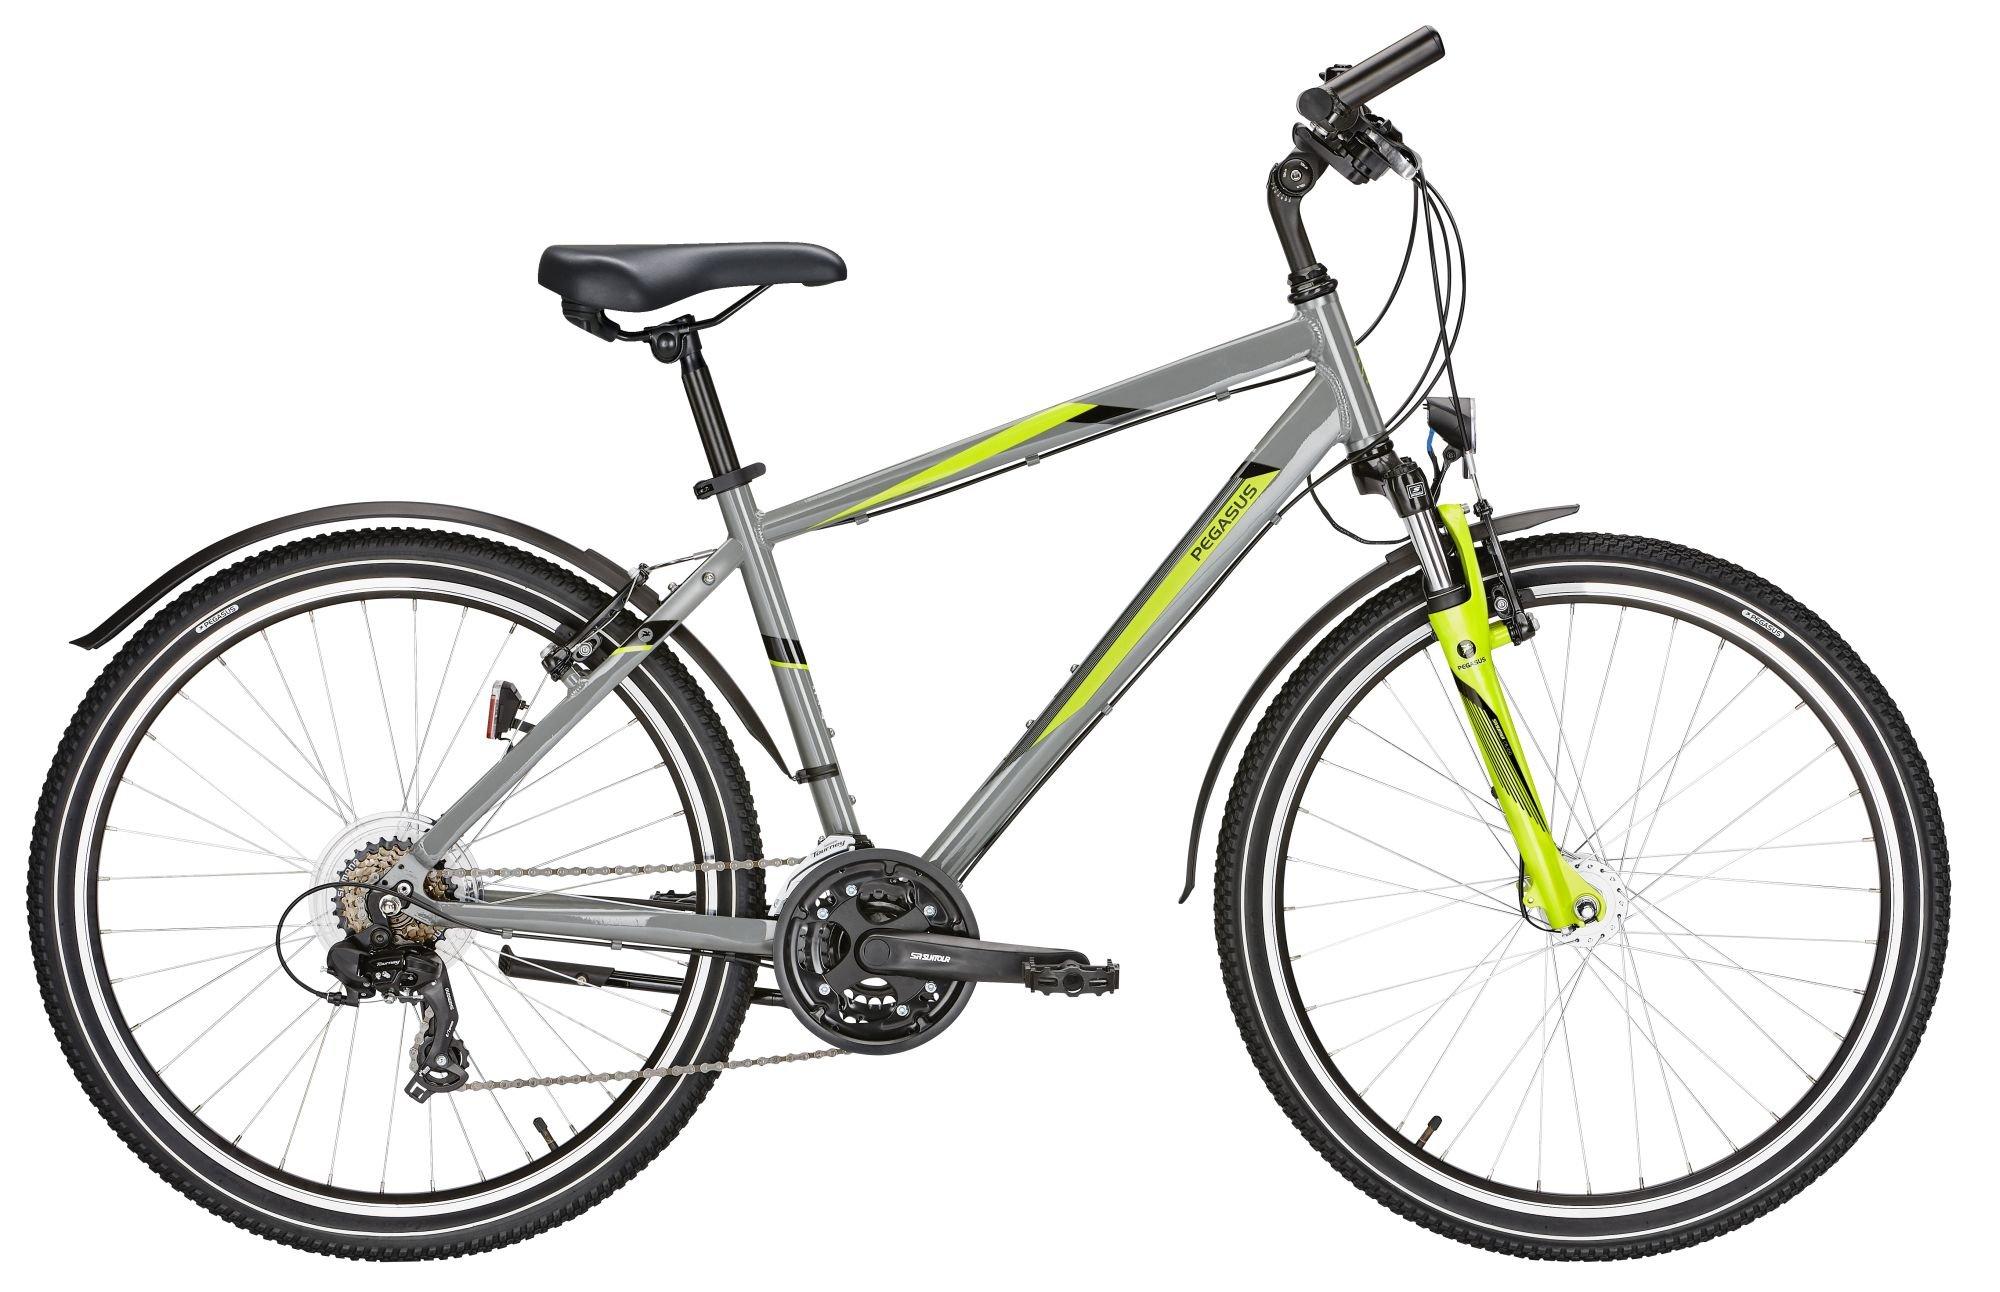 jugendräder 20''-26''/Mountainbikes: Diamant  Avanti Sport 18  26 Zoll 18 Gang Kettenschaltung Jungenfahrrad Diamant Modell 2021 26 Zoll 50 cm